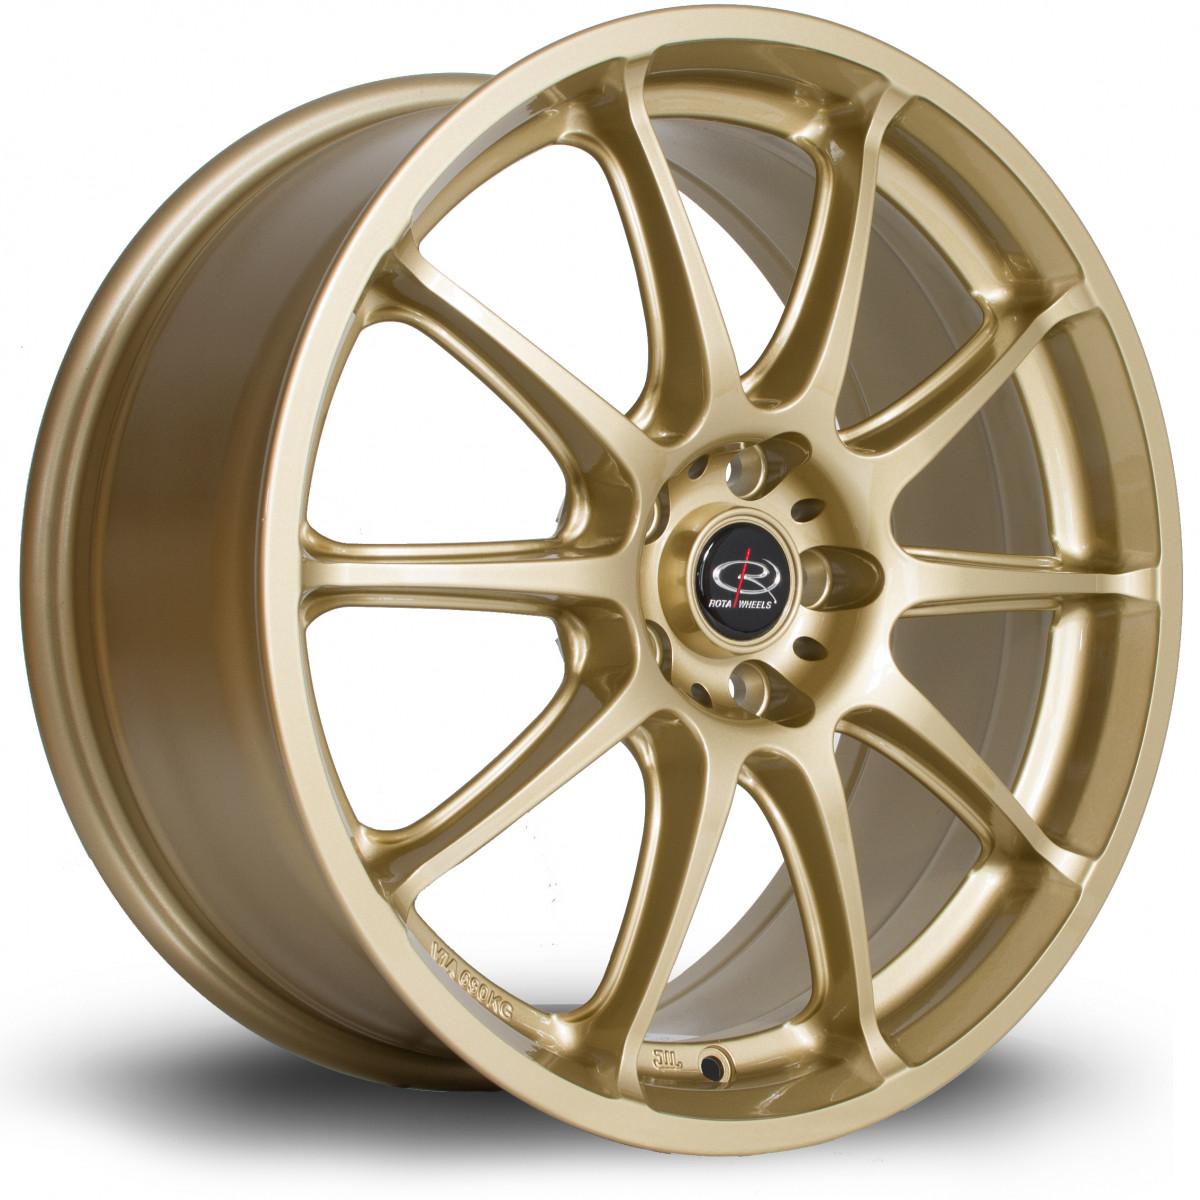 Gra 17x7.5 5x100 ET48 Gold